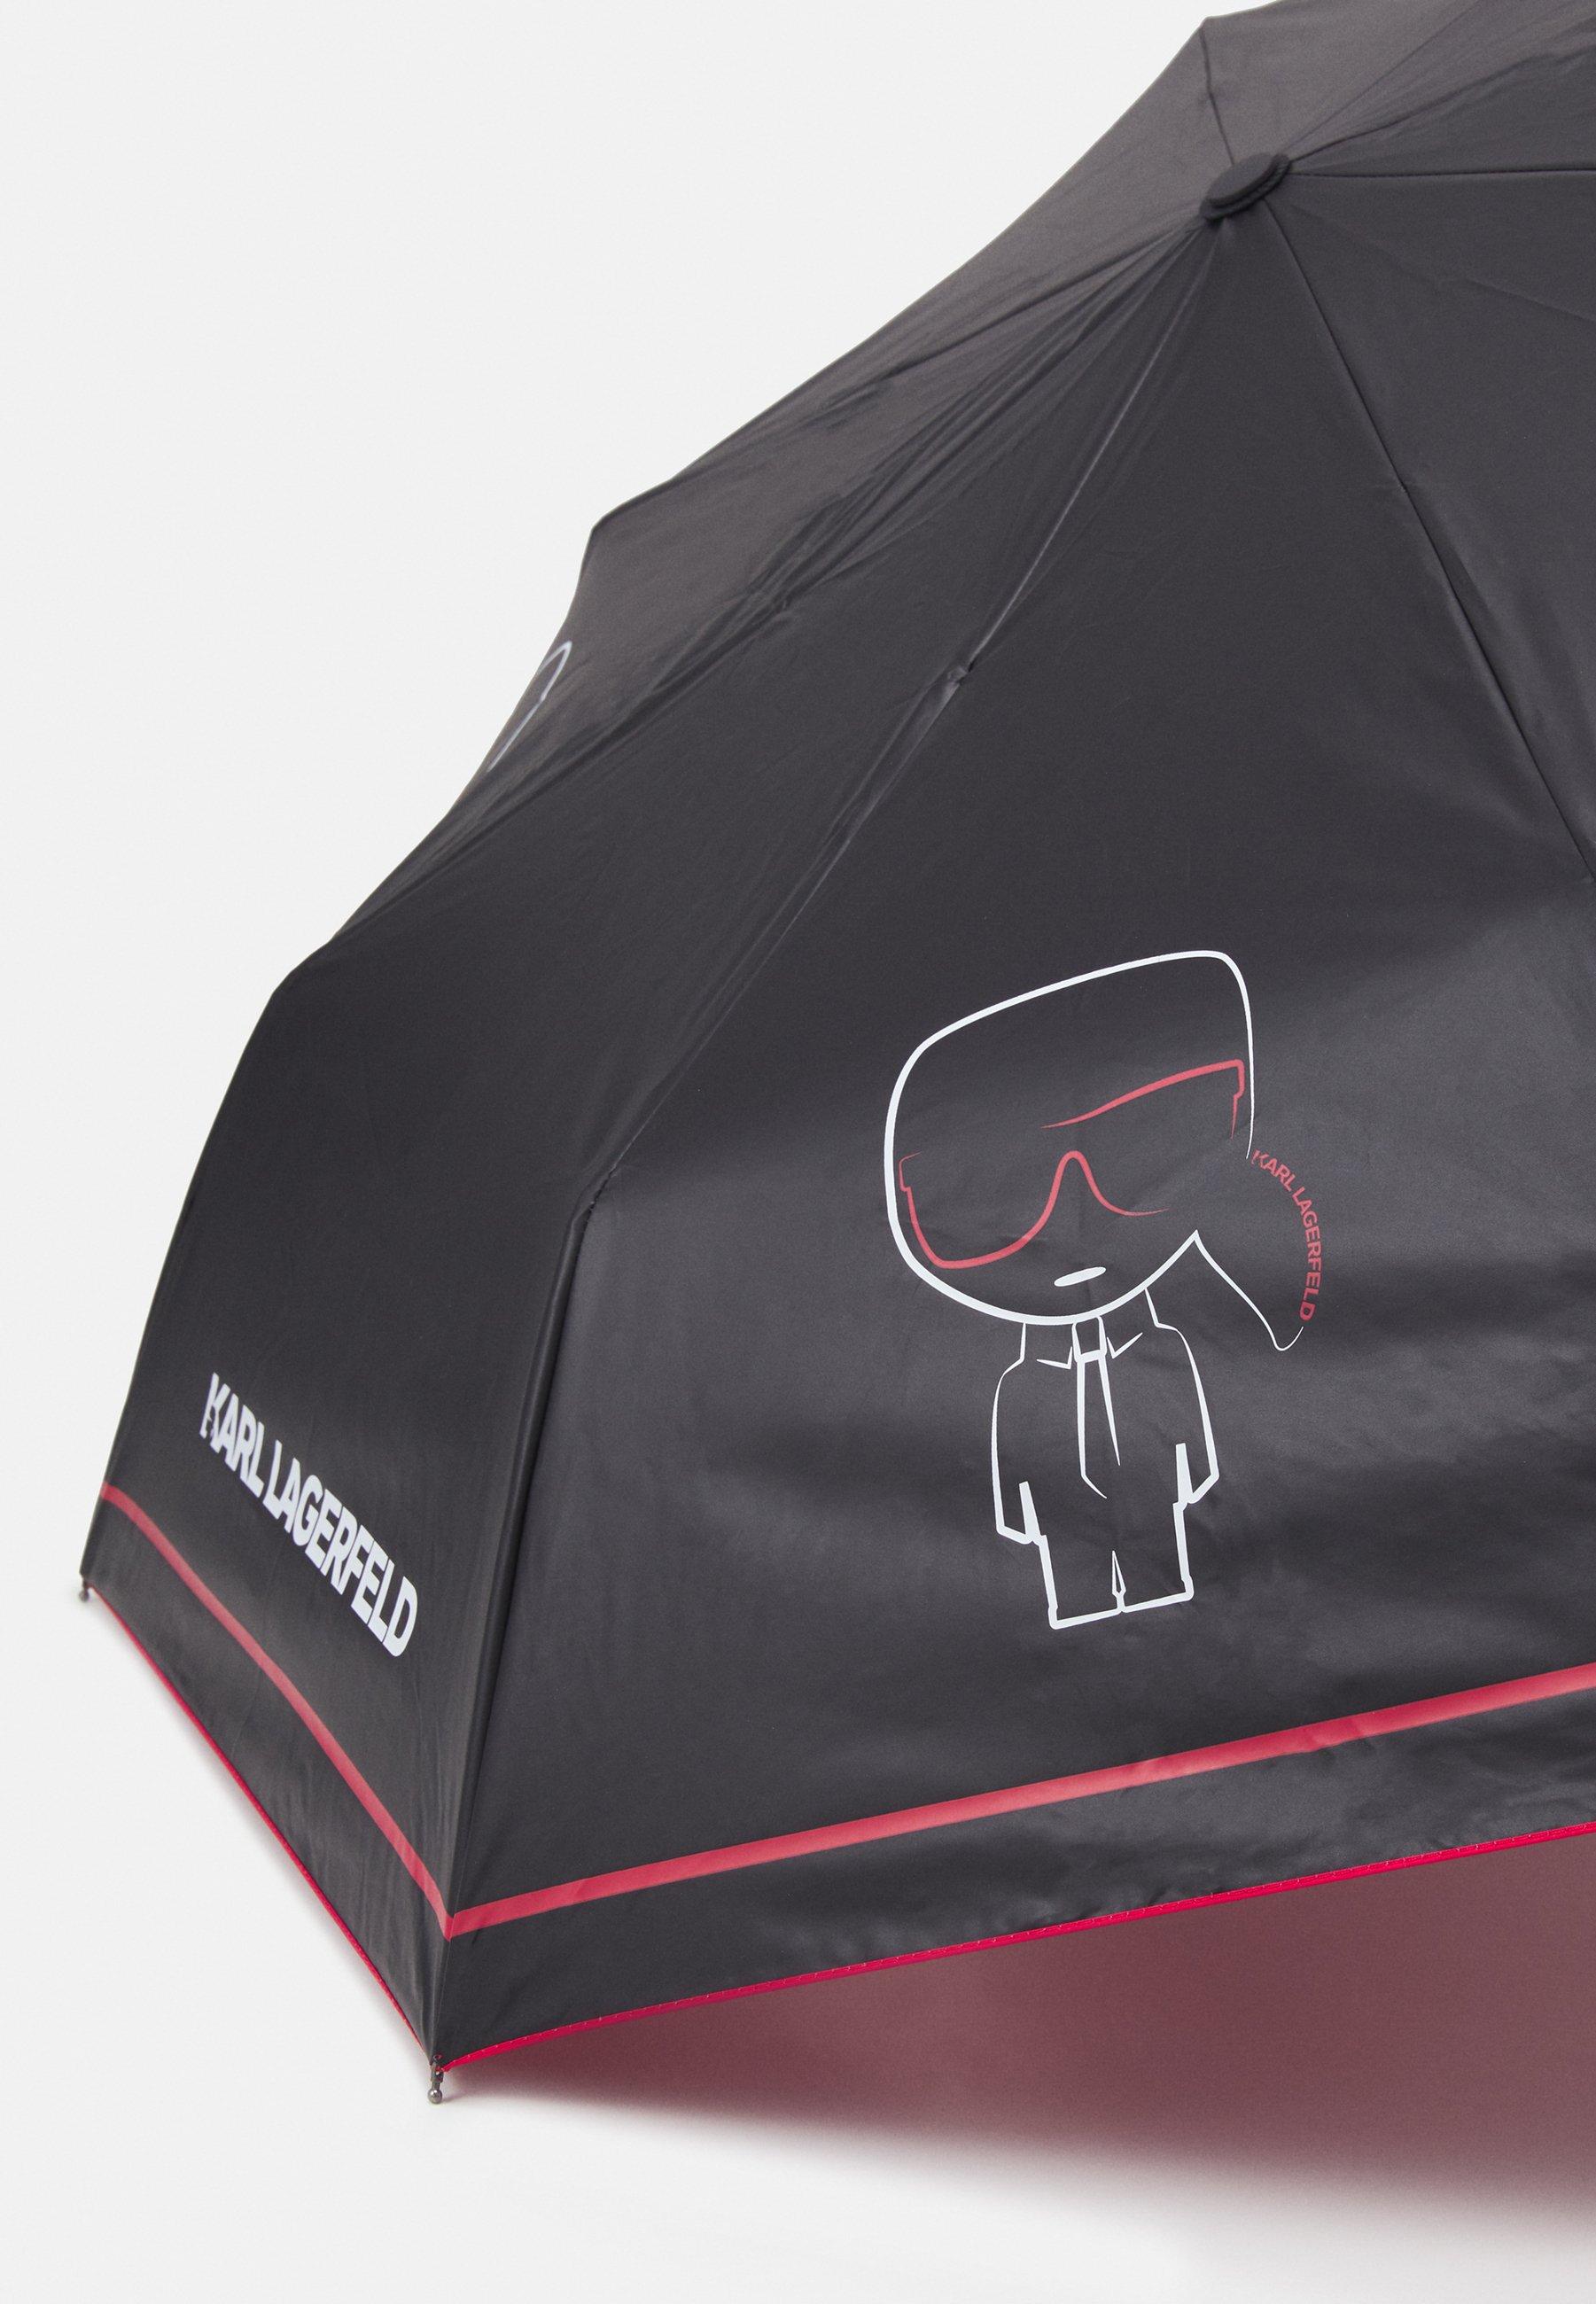 KARL LAGERFELD IKONIK OUTLINE UMBRELLA - Paraply - black/svart ZjC9yD6RS2H2wJv